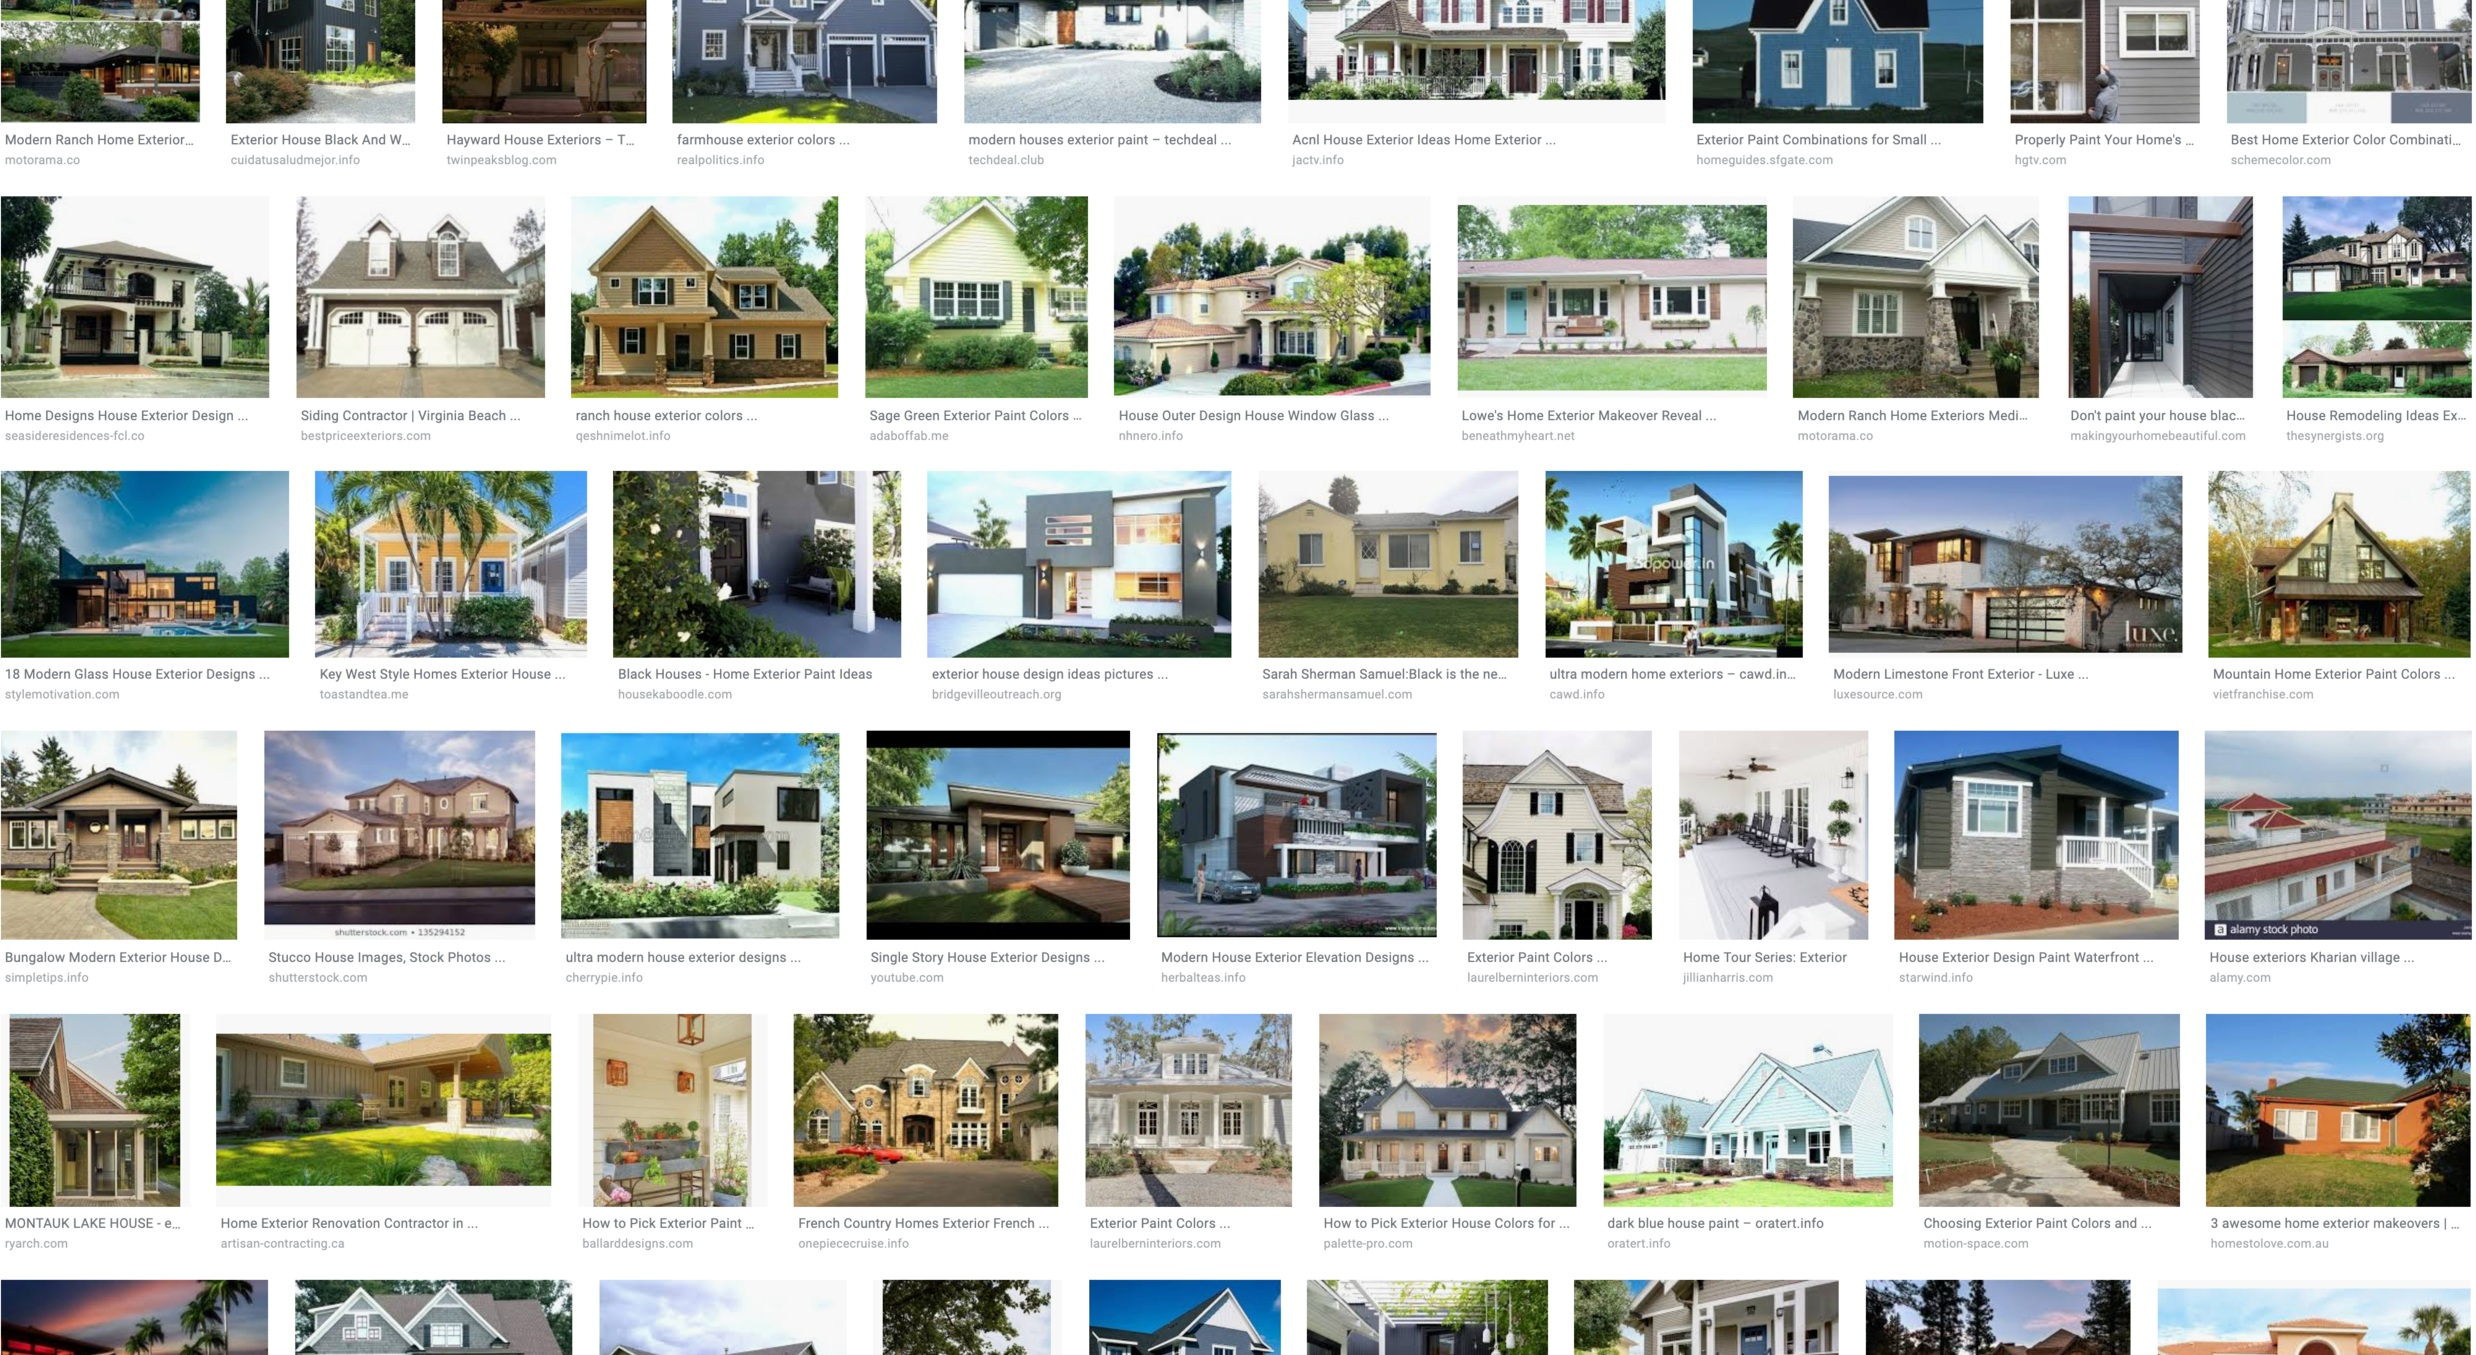 googlesearchresults.jpg